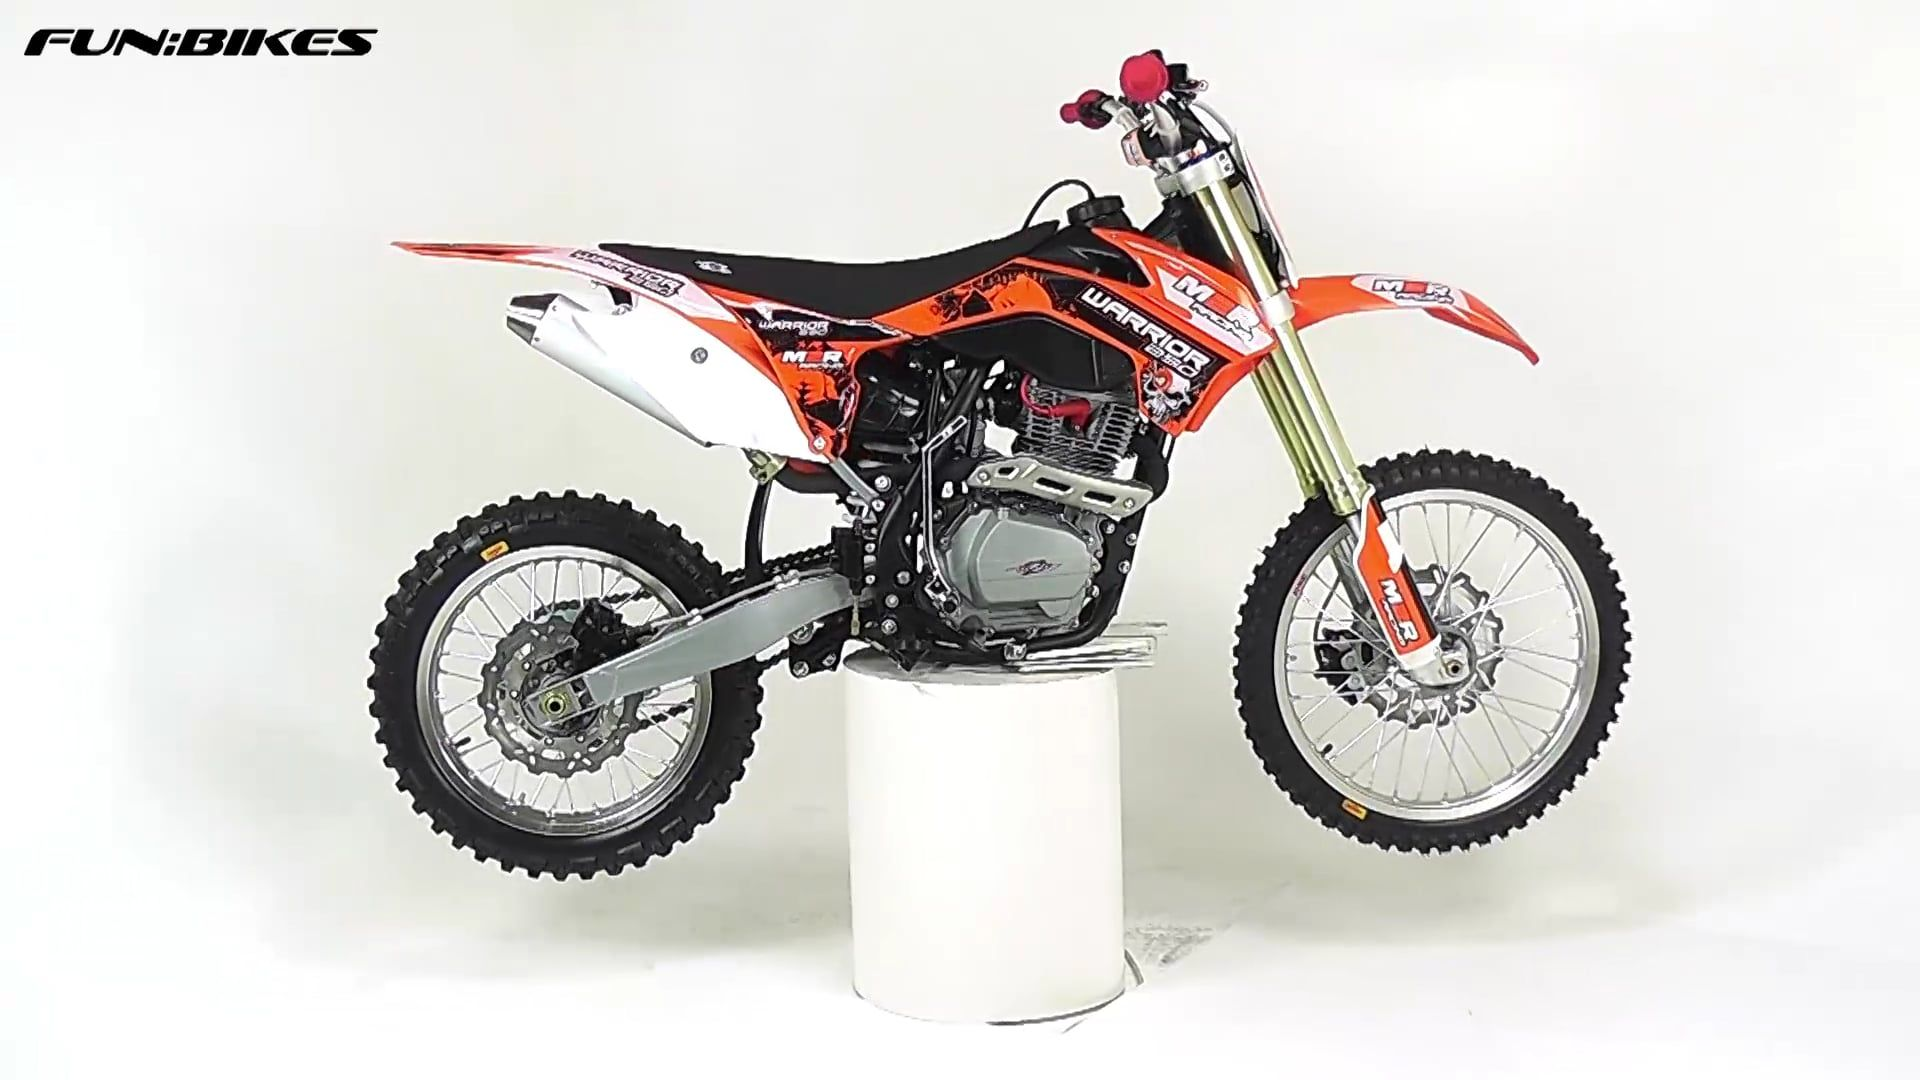 M2R Racing Warrior J1 250cc 21/18 96cm Dirt Bike     Dirt